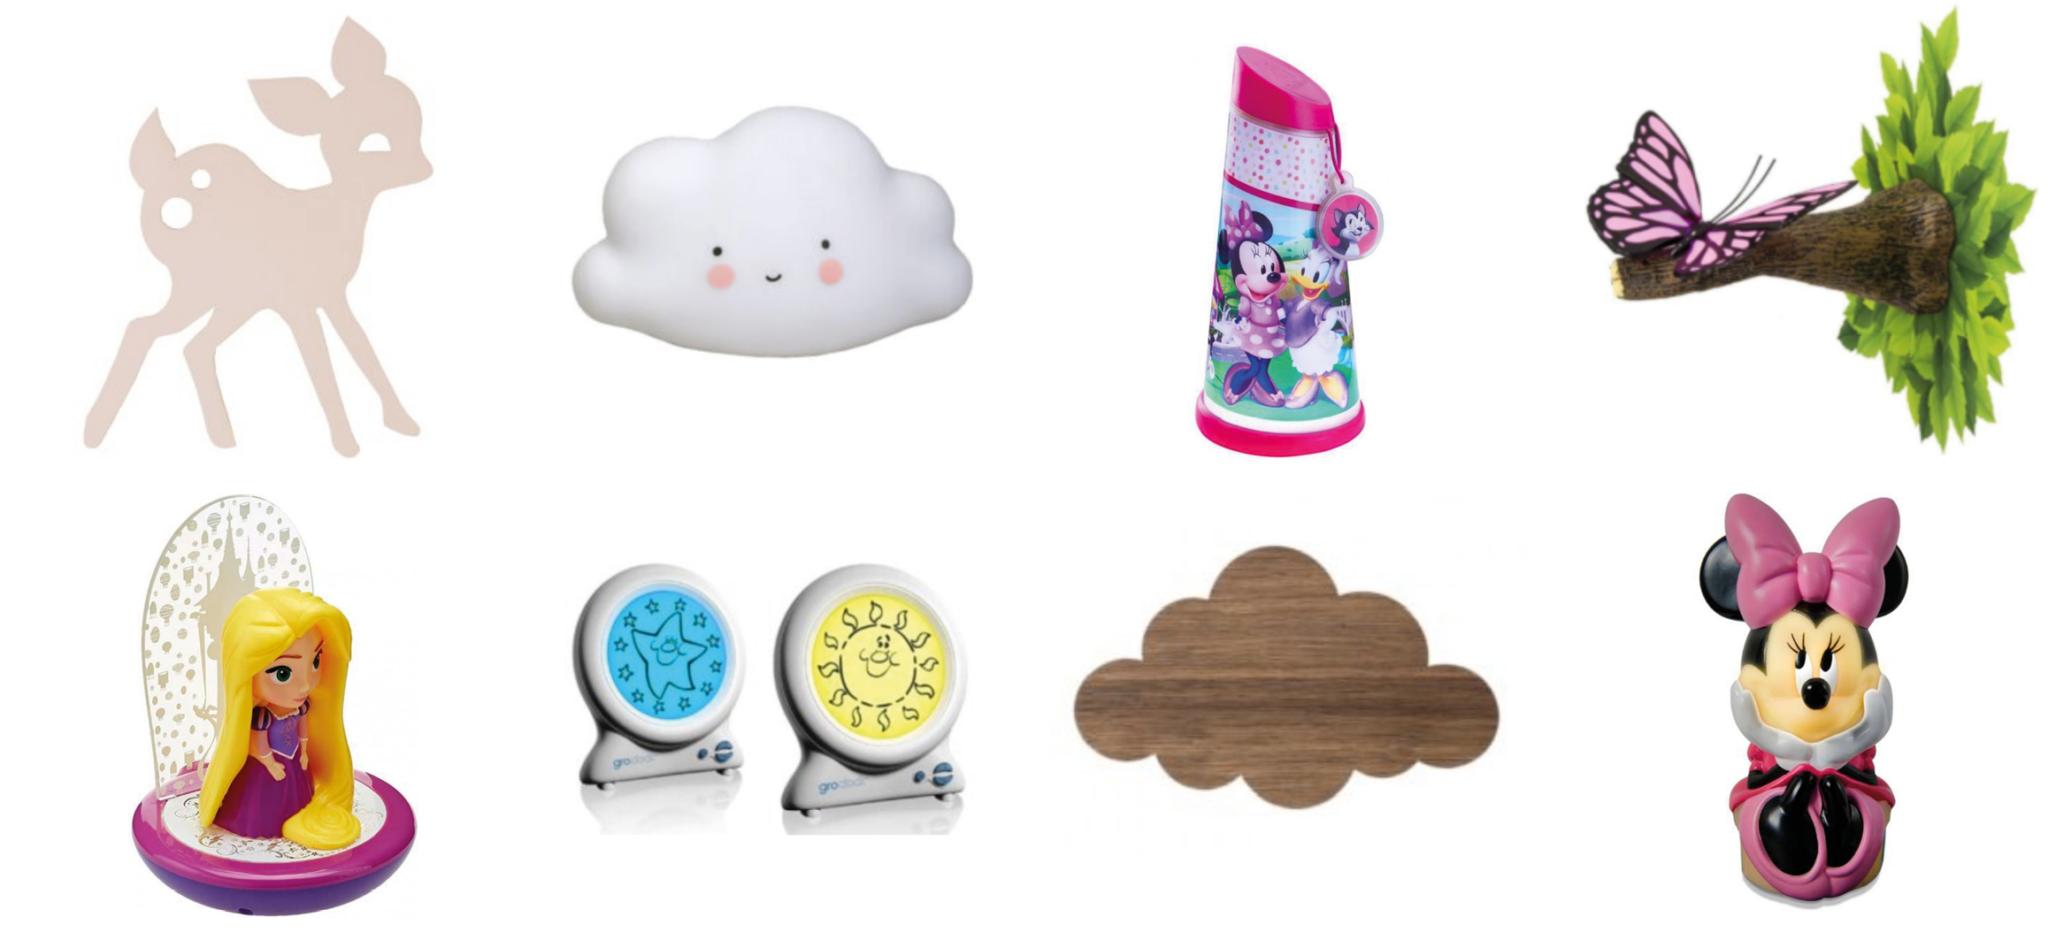 pigeværelse, pigeværelse bordlampe, bordlampe pigeværelse, bordlampe børneværelse, lamper til børneværelse, lamper til børn, smarte lamper til piger, seje lamper til piger, seje lamper til pigeværelse, søde lamper til pigeværelse,